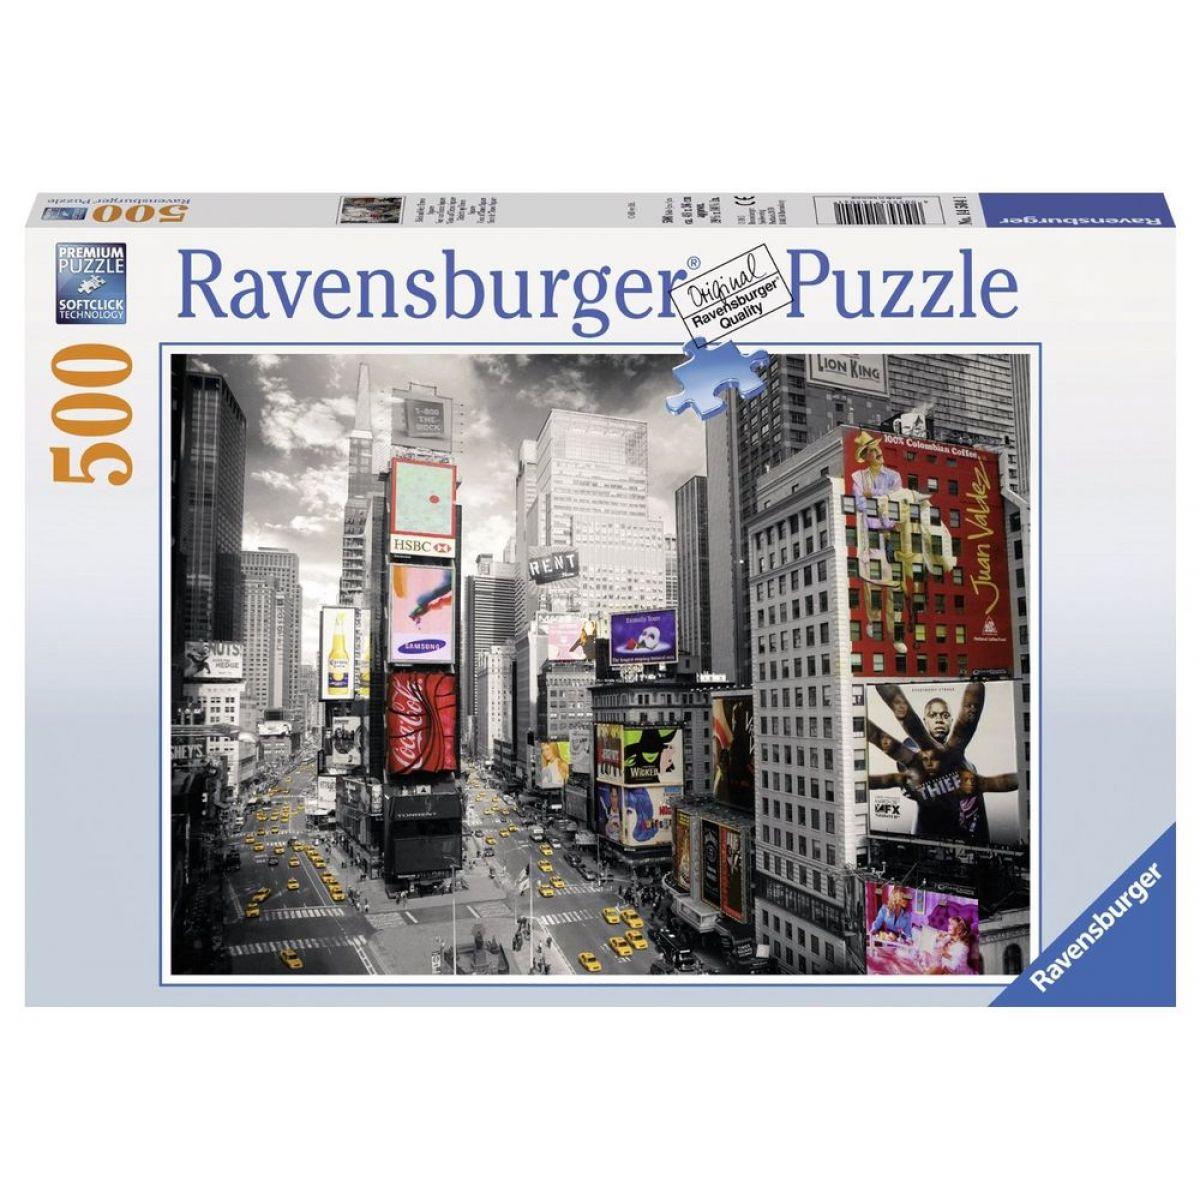 Ravensburger Puzzle Time Square GB Eye 500 dílků